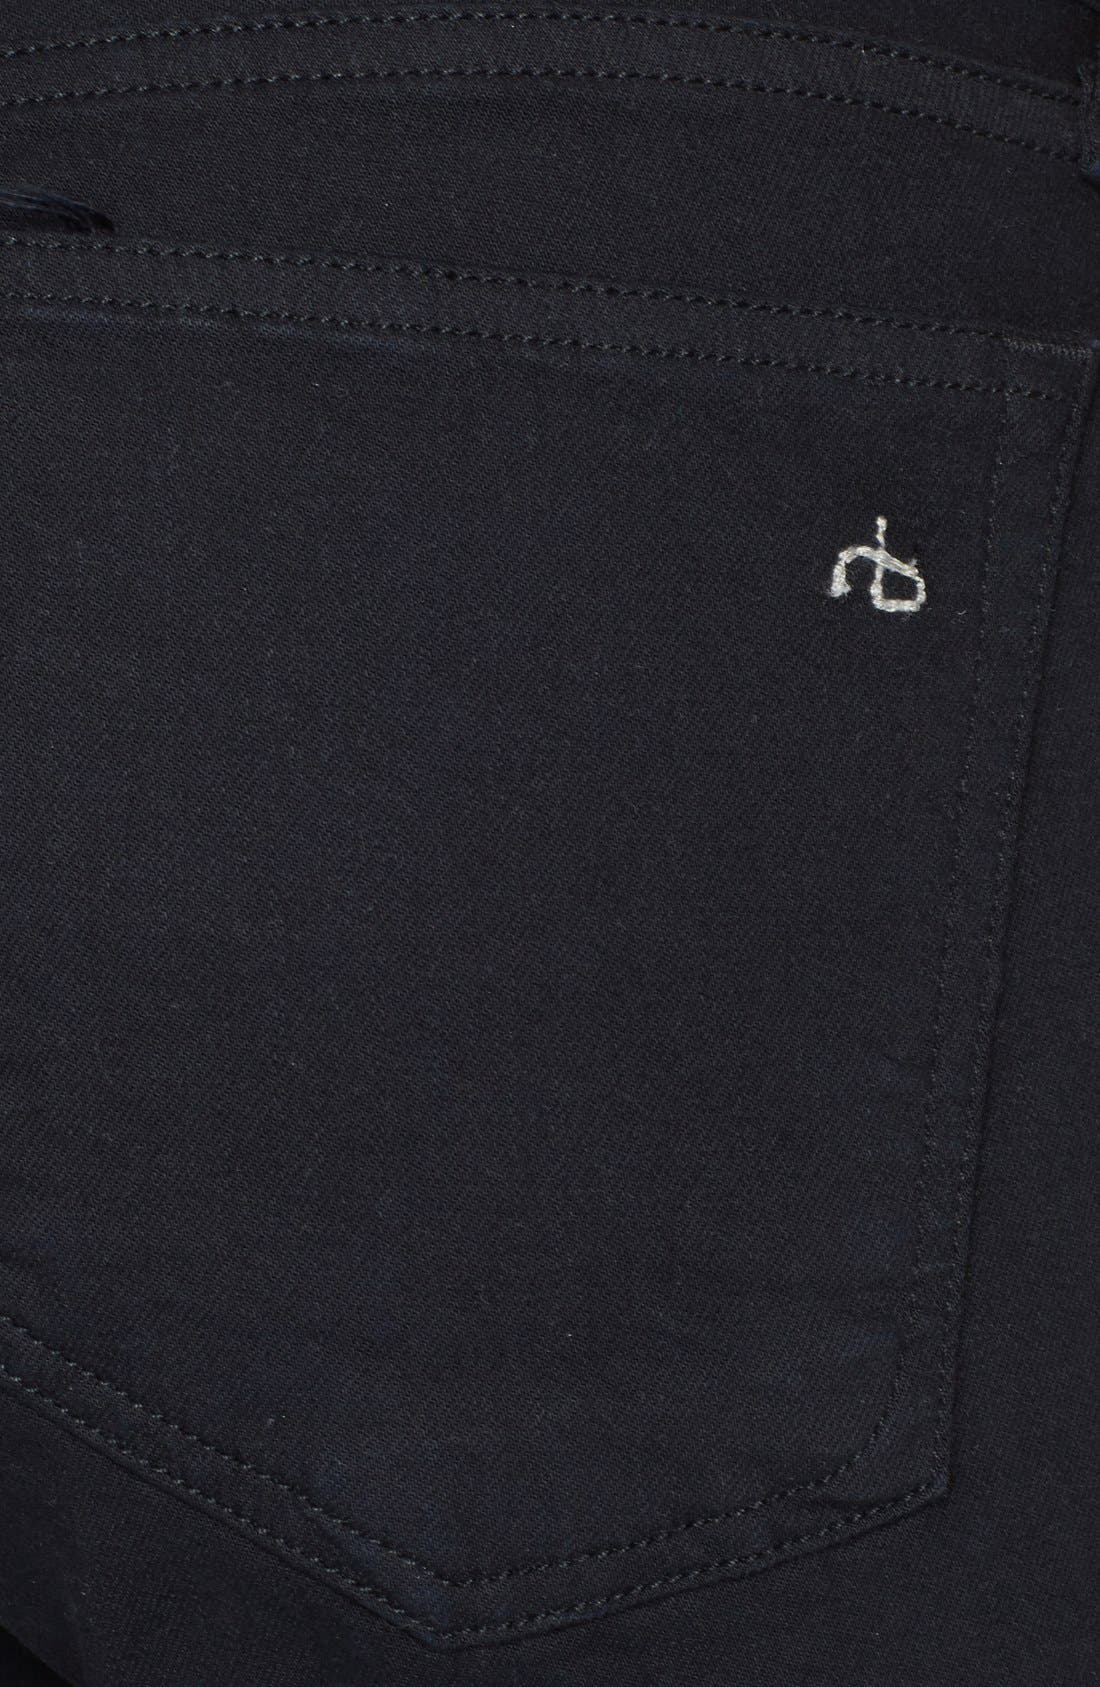 'The Dre' Skinny Jeans,                             Alternate thumbnail 3, color,                             Aged Black